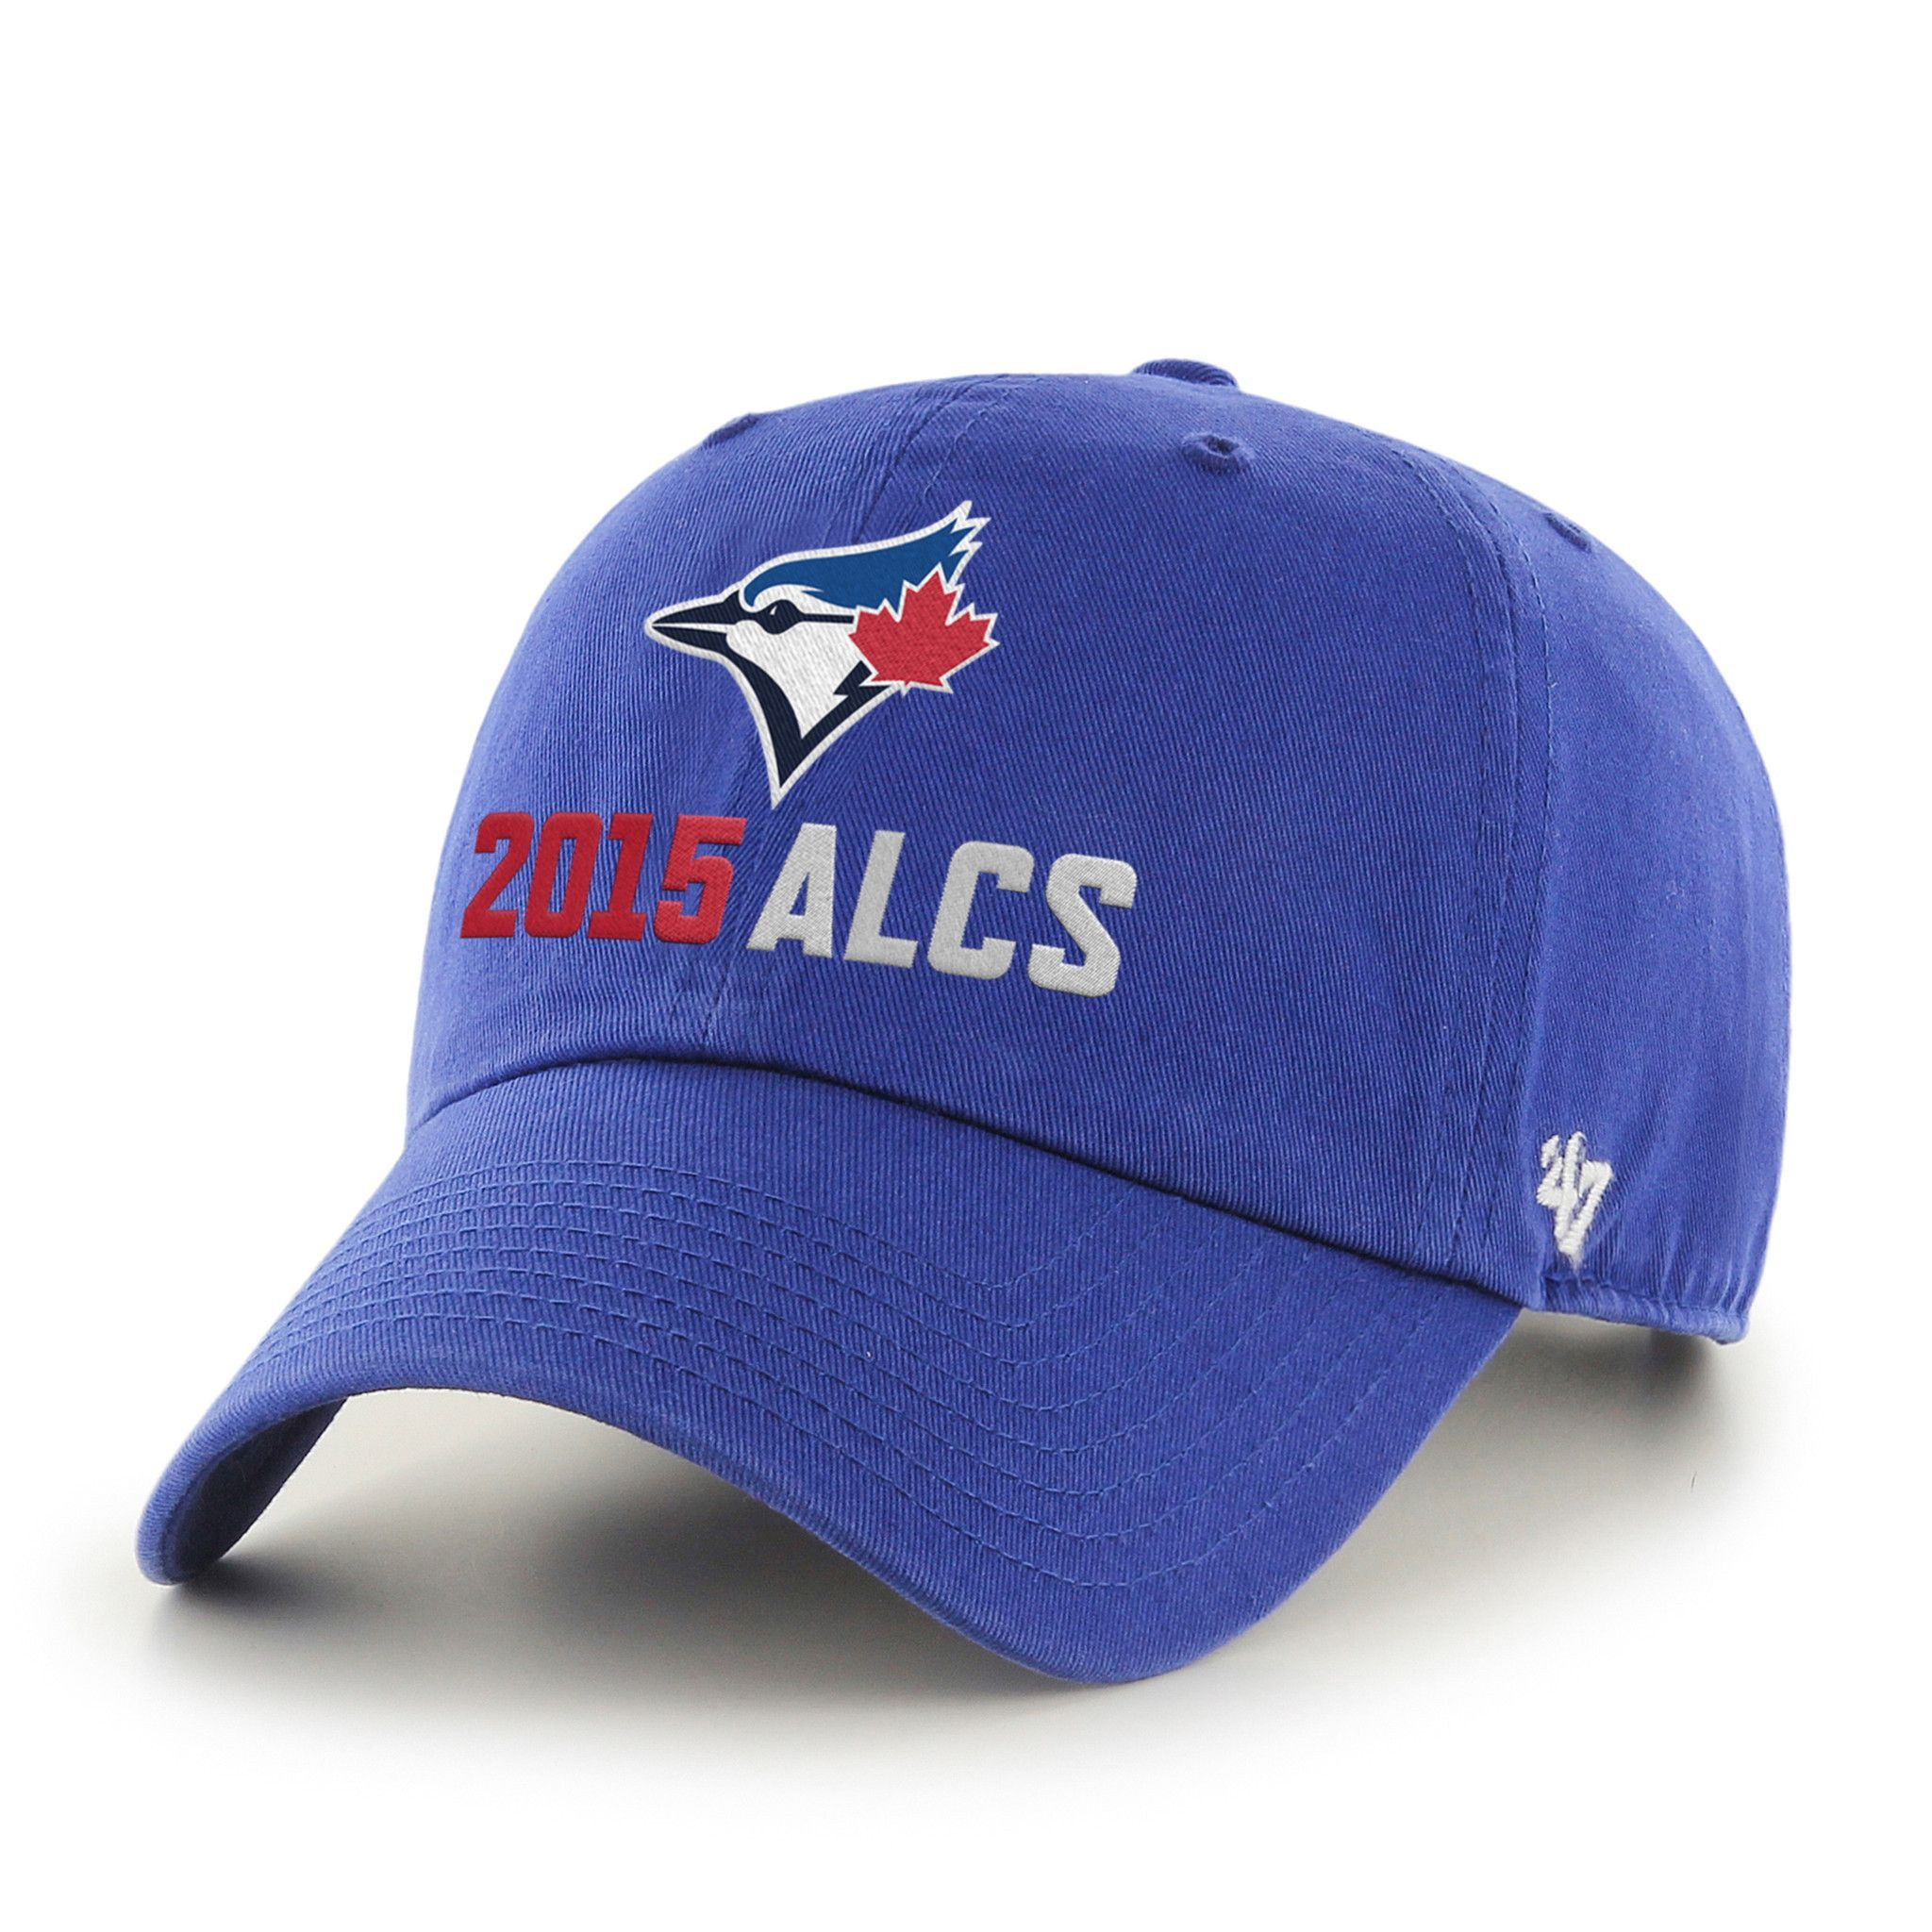 Toronto Blue Jays 47 Brand 2015 MLB Postseason ALCS Adjustable Relax Hat Cap